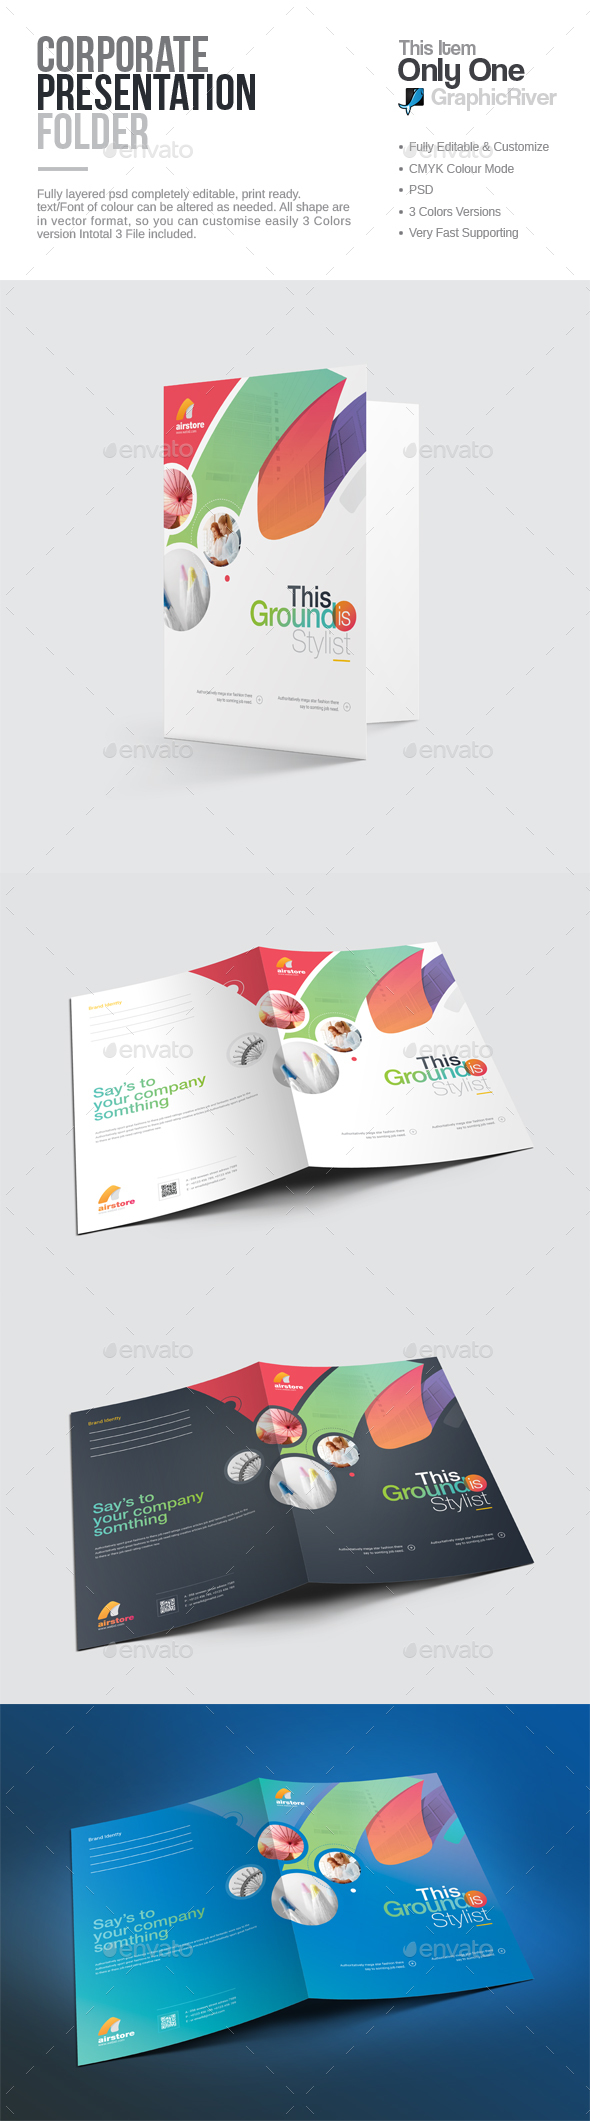 GraphicRiver Presentation Folder 20545527